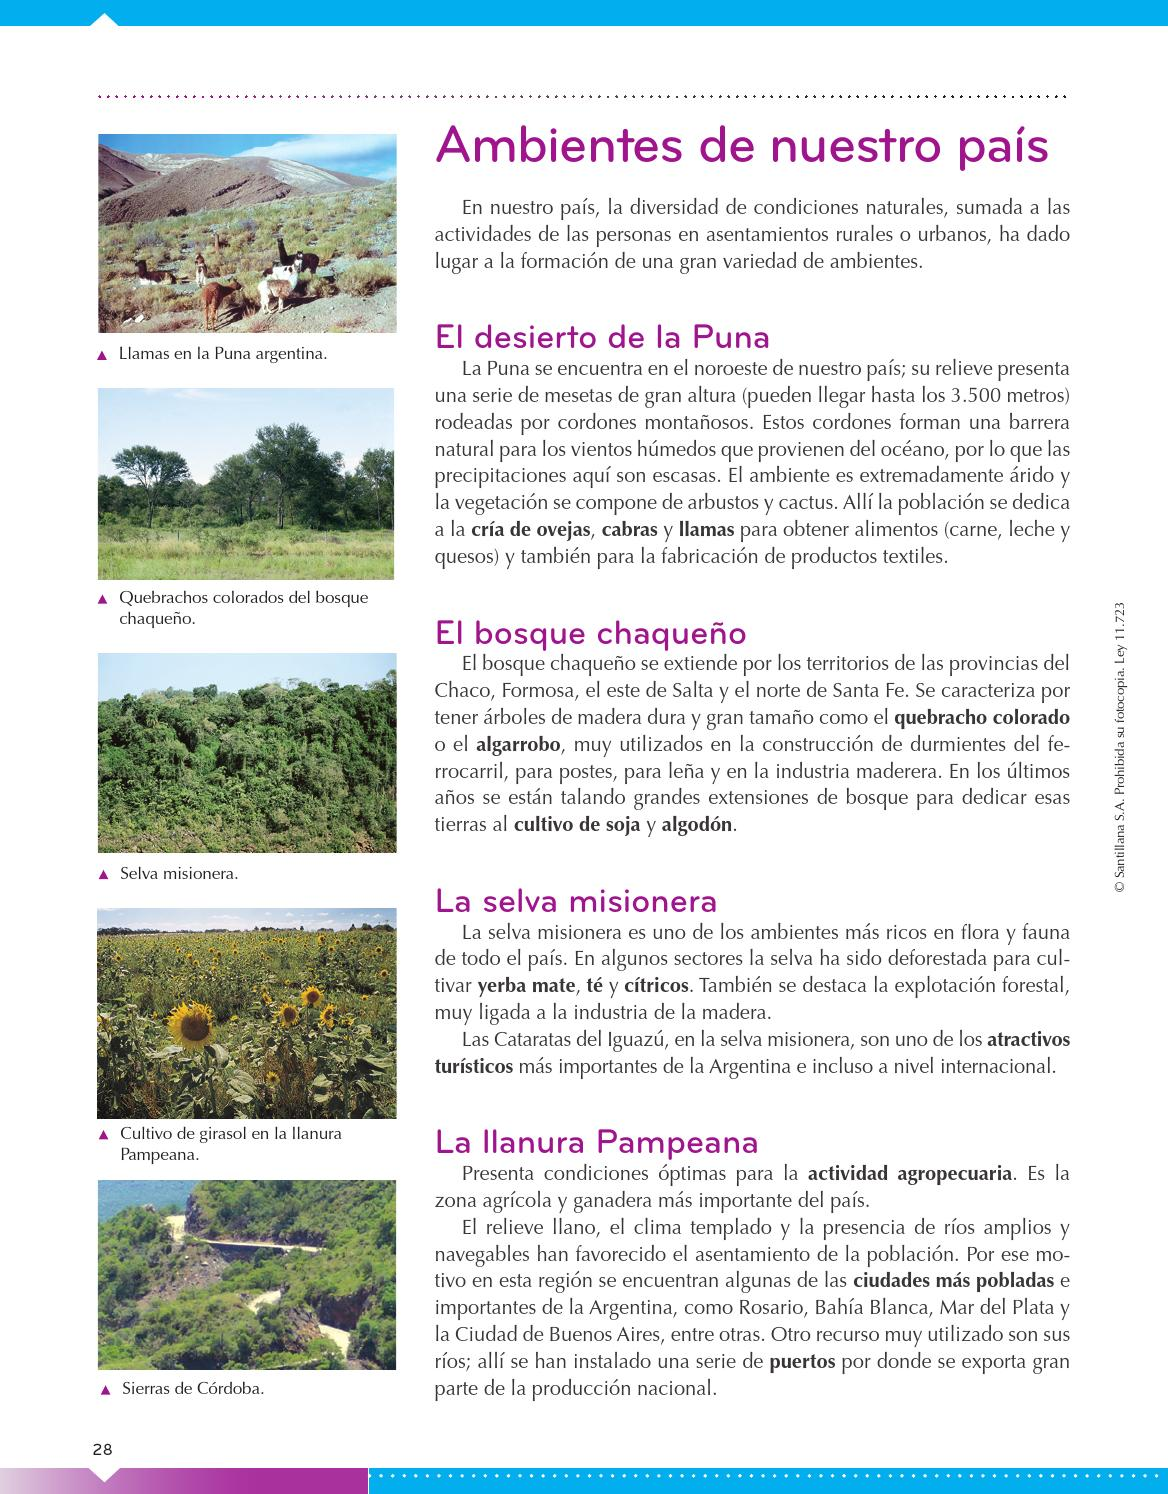 Biarea sociales lengua 6 nacion 2014 print by mar a for Ambientes de argentina